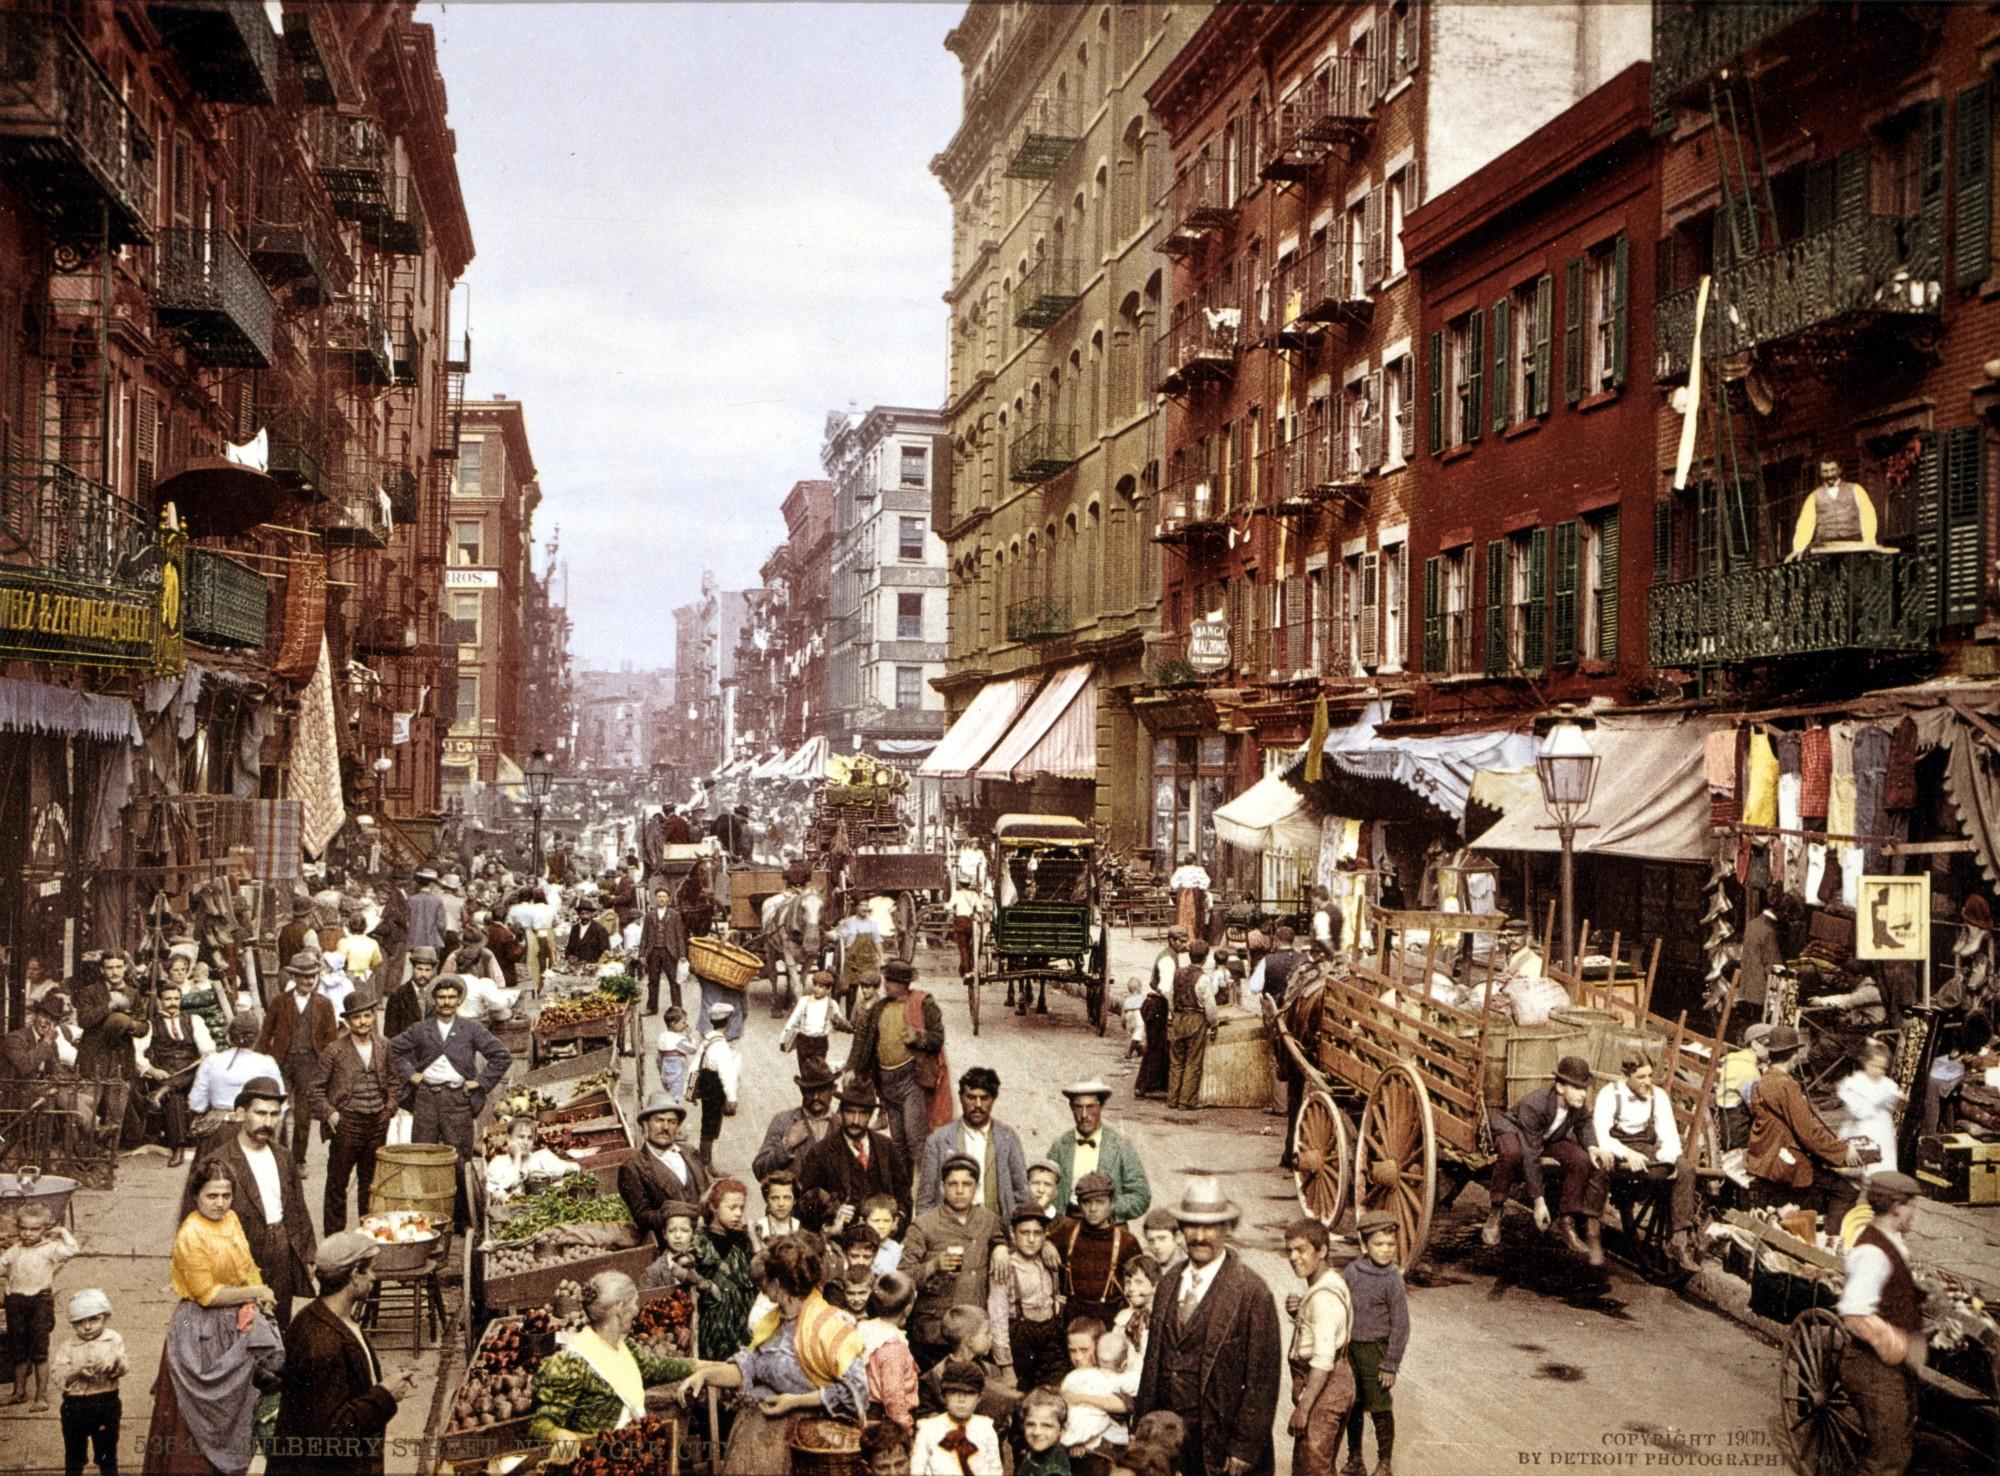 Mulberry_Street_NYC_c1900_LOC_3g04637u